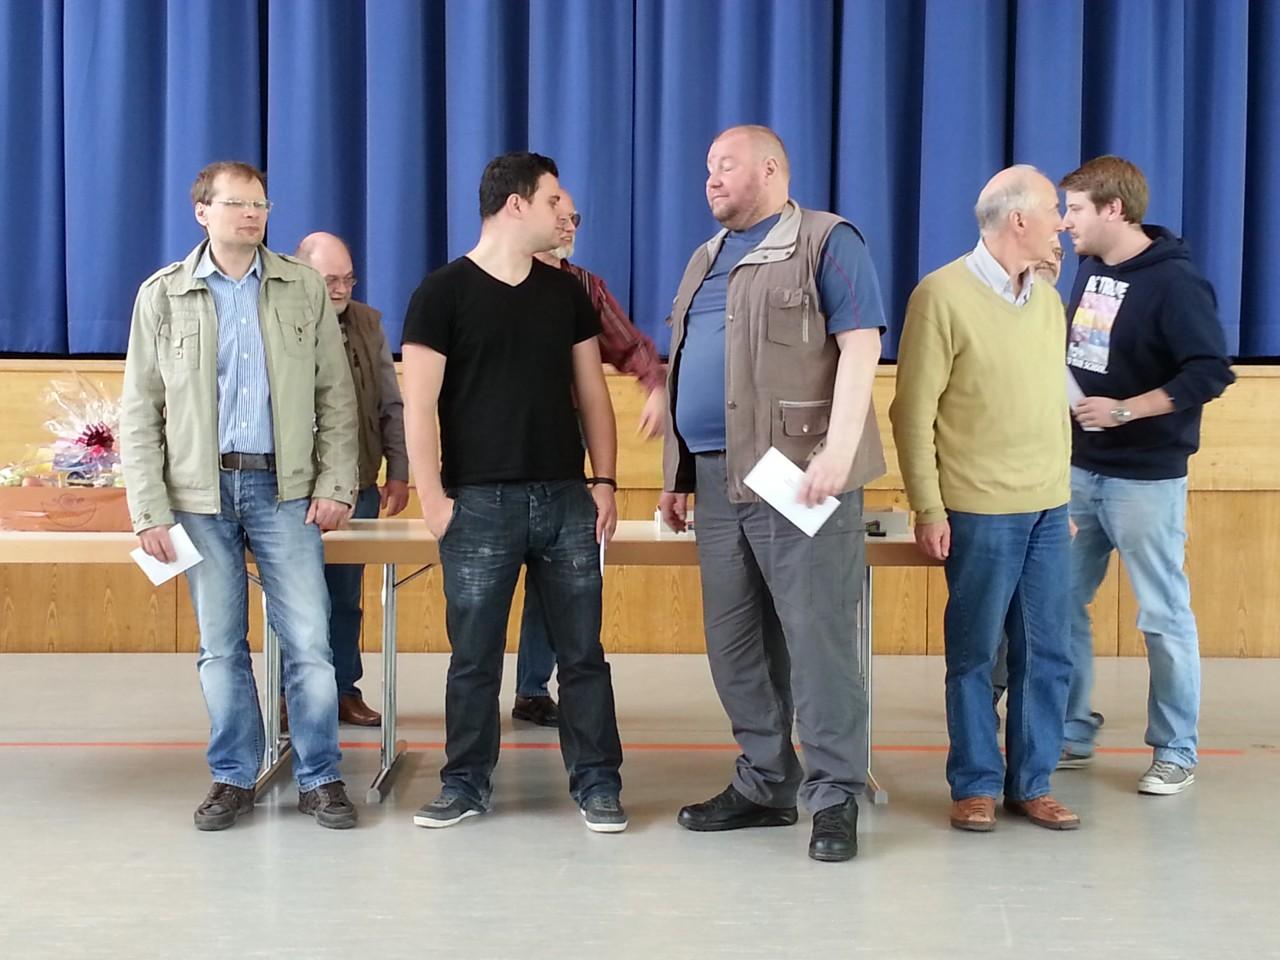 v.l.n.r.: GM Ikonnikov(2.),IM Cuenca Jimenez(1.), GM Karpatchev(3.)